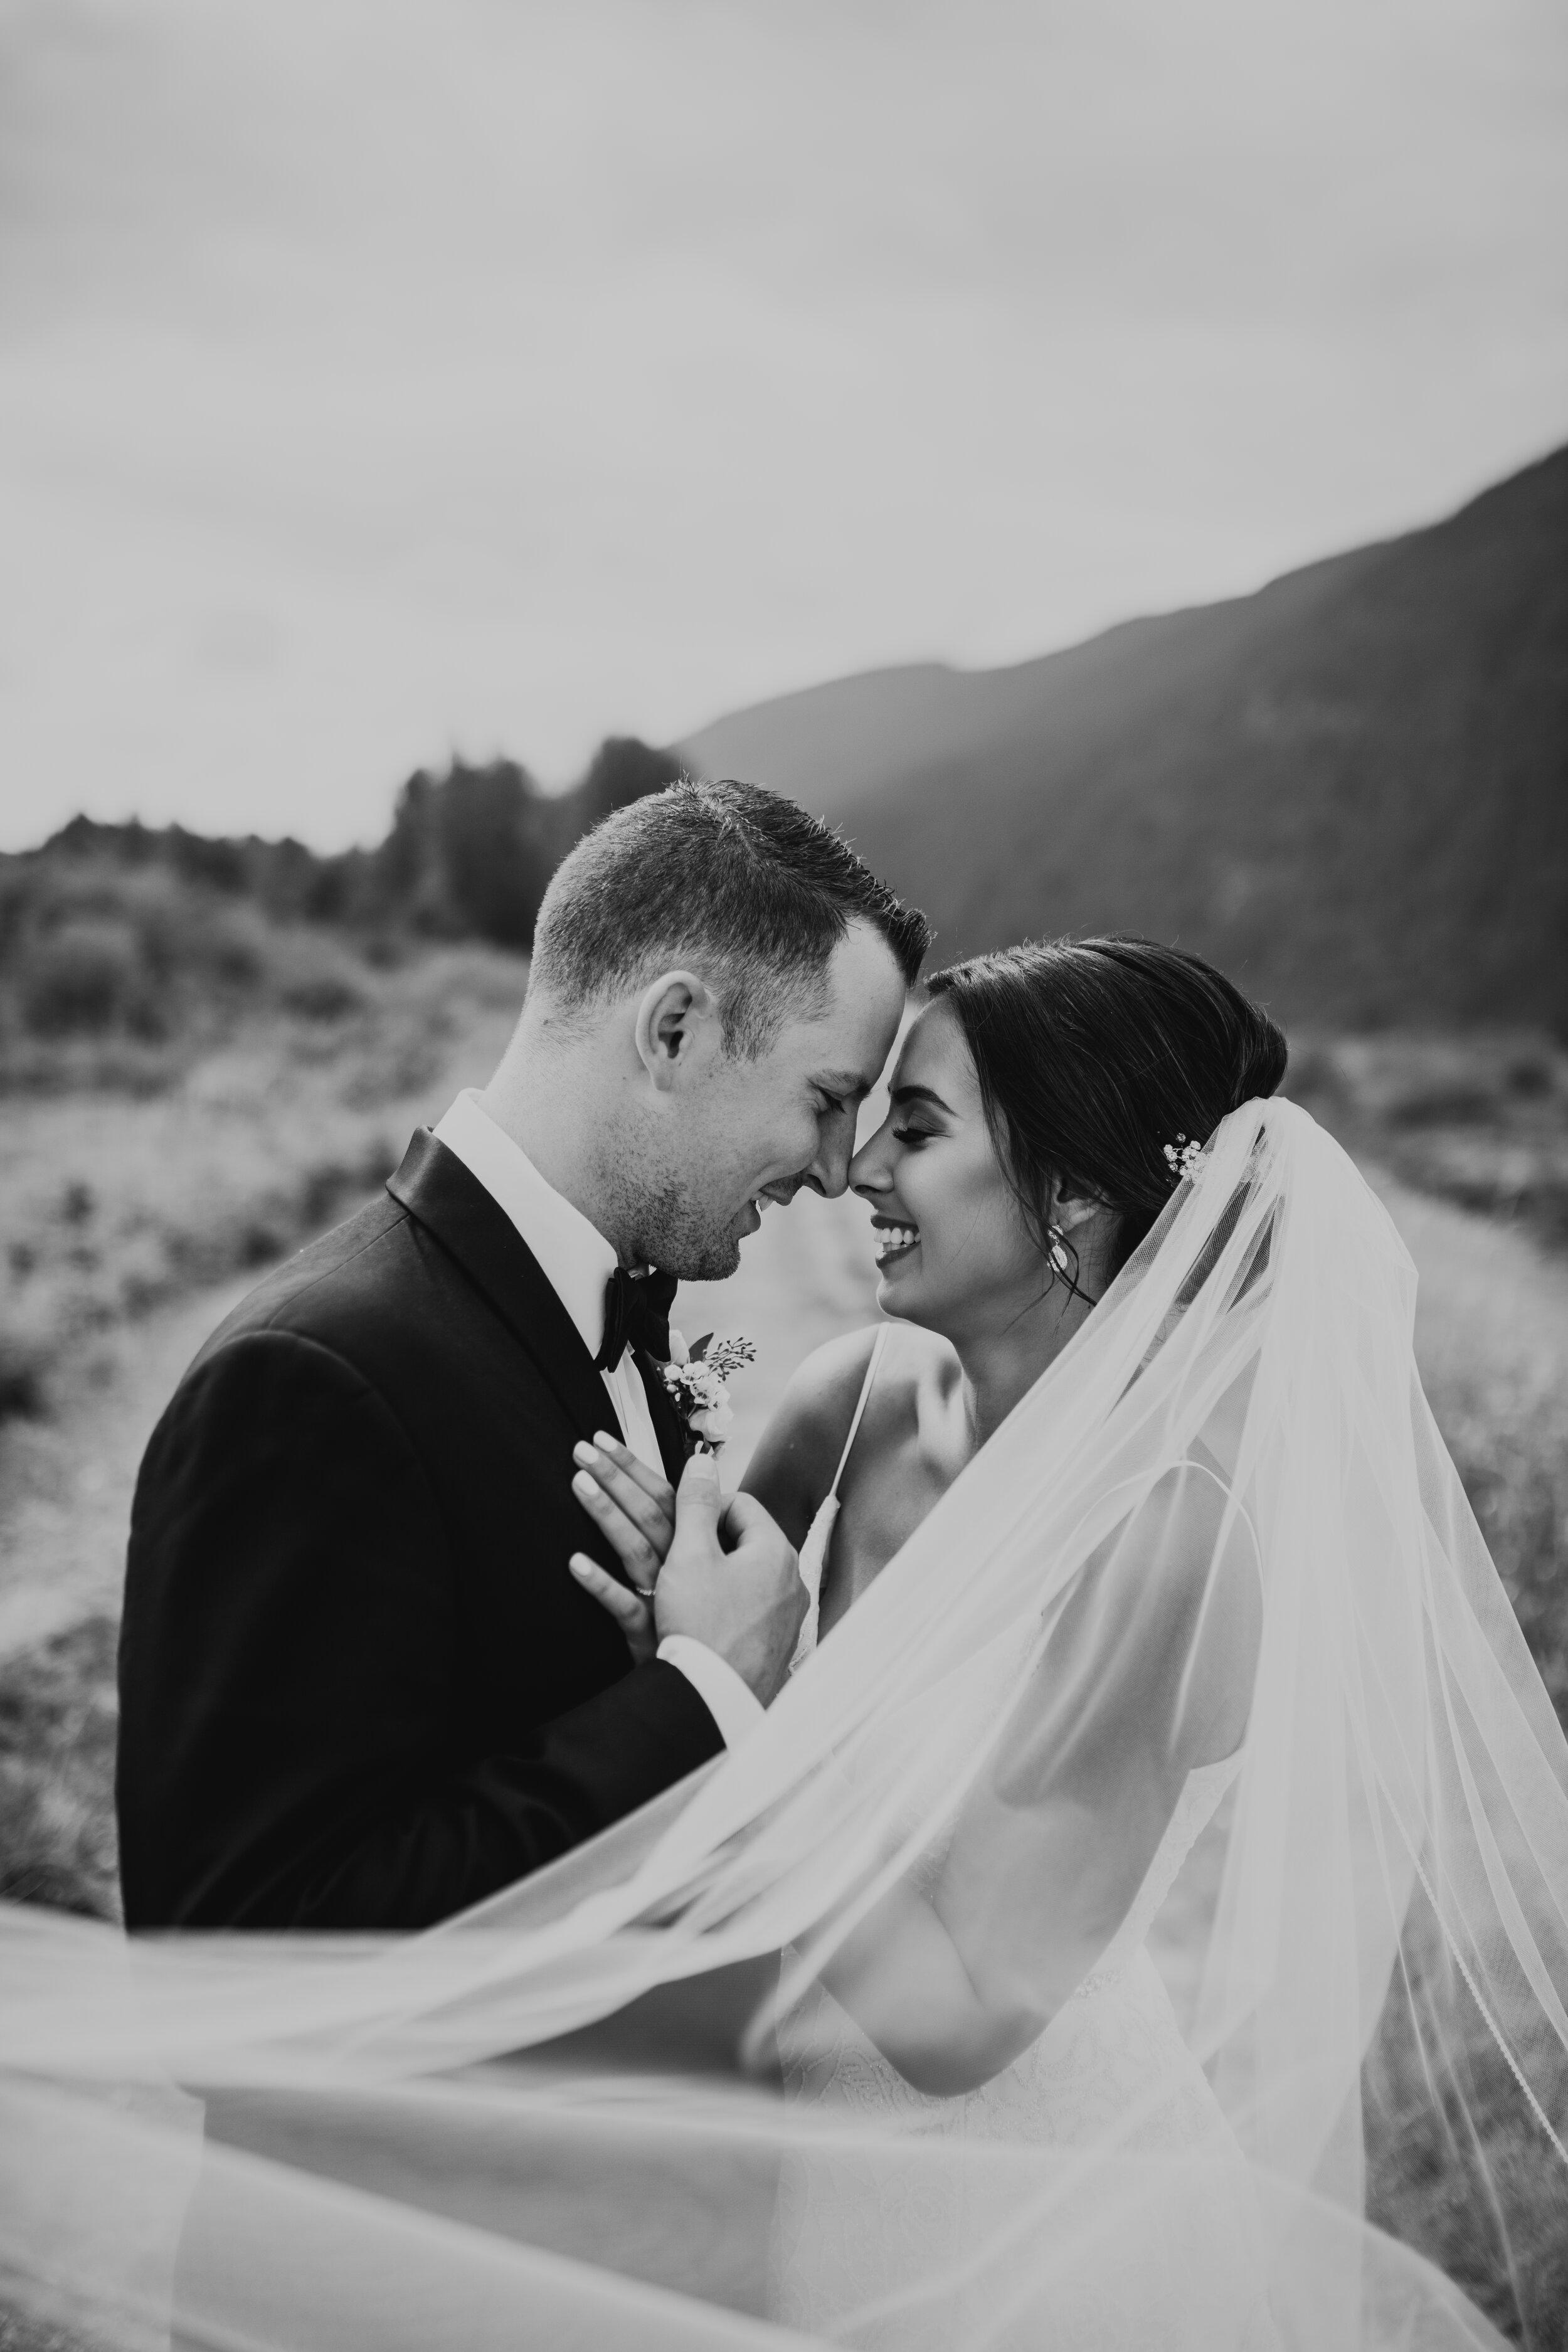 Natasha & Lee Sneak Peeks - August 31, 2019 Swaneset Wedding-1257.jpg